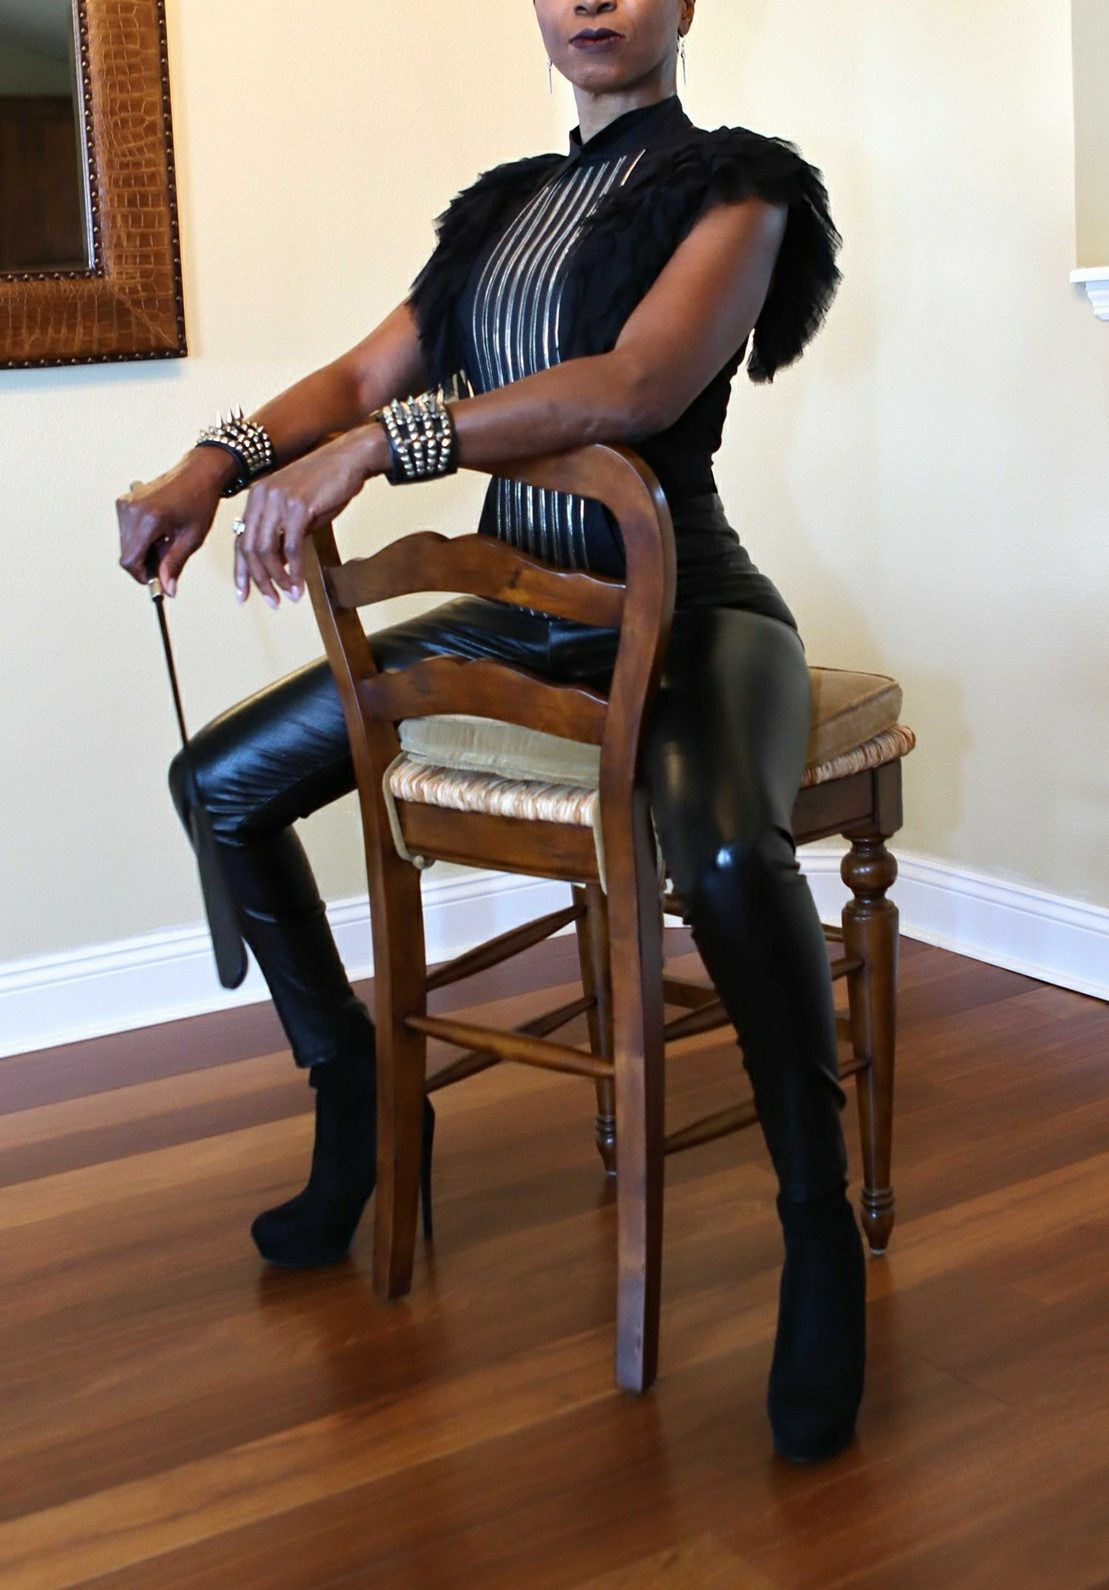 Tampa Bay Dominatrix, Florida   Tampa Mistress, Bondmassage, Tampa Prostate Massage, ebony mistress, sensual Dominatrix, Empress Raven , Tampa Bay Dominatrix, bdsm